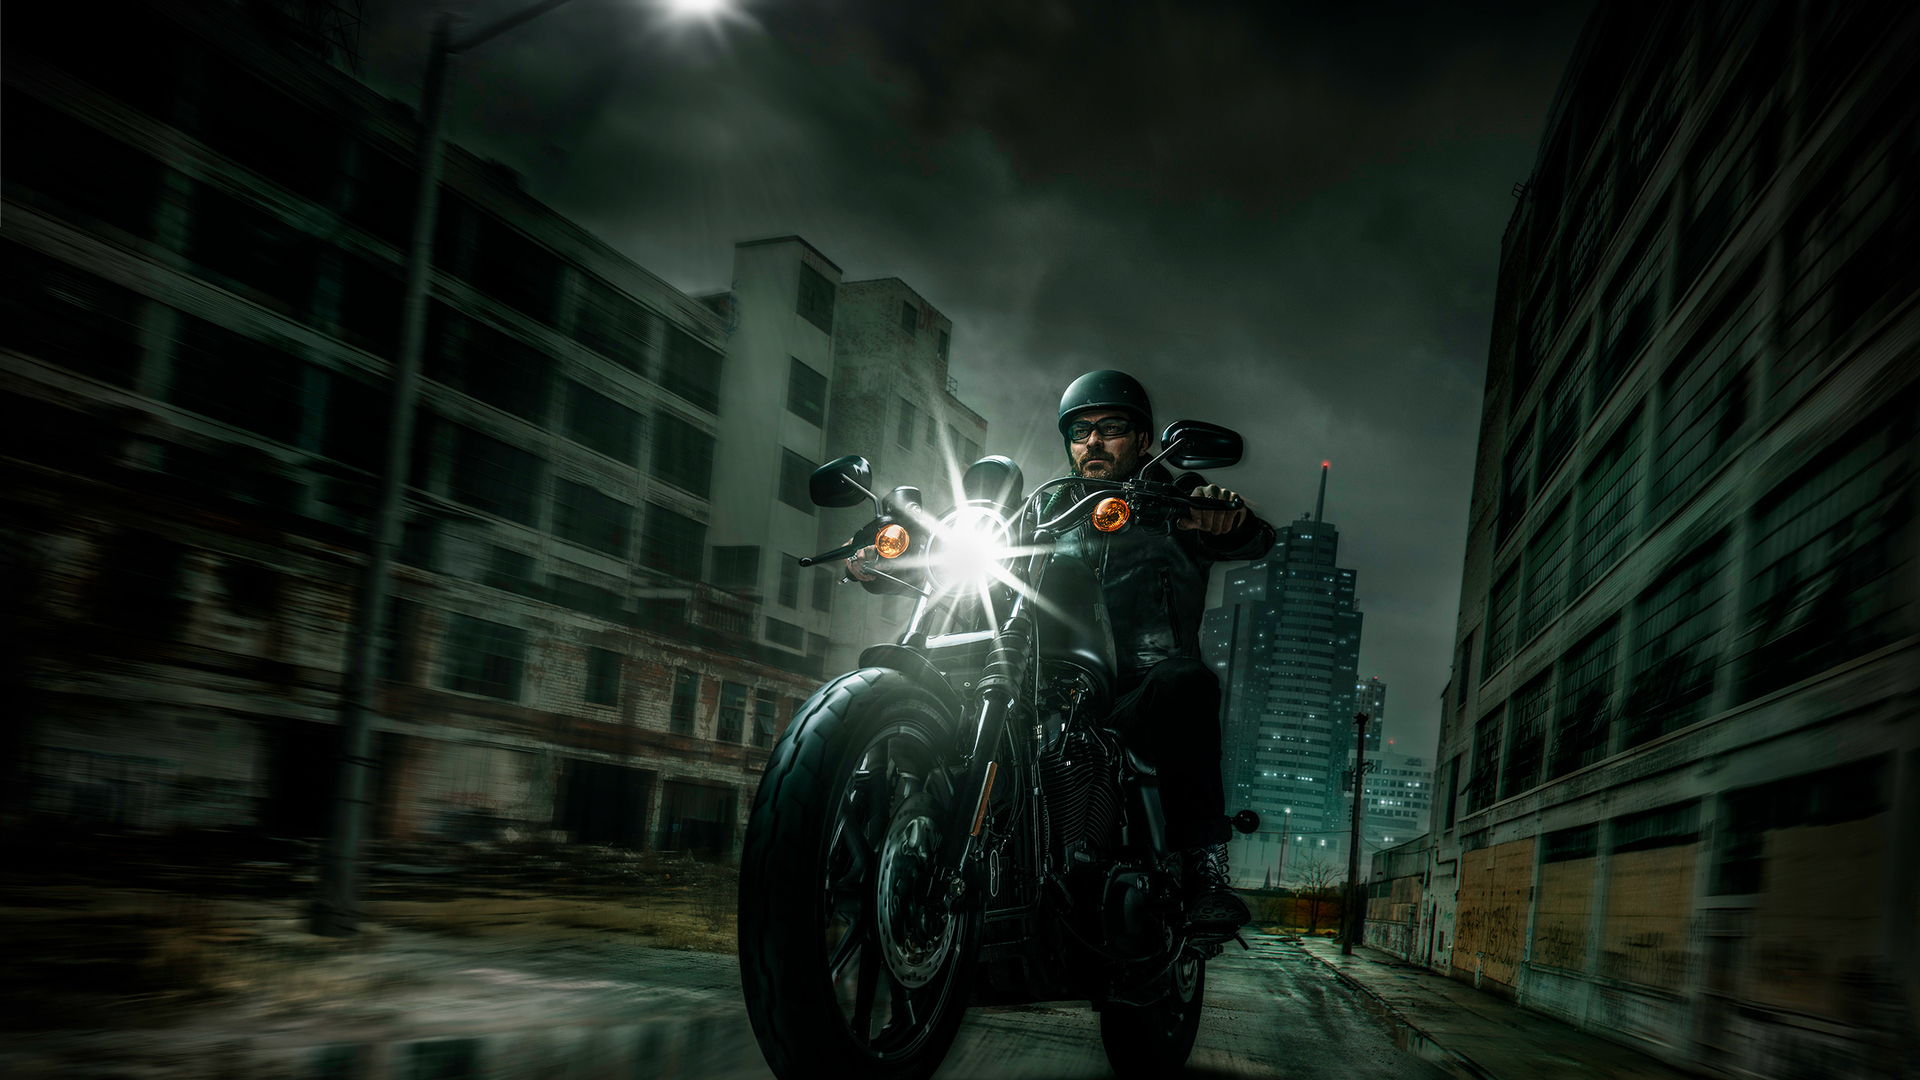 1920x1080 Harley Davidson Night Riders Laptop Full Hd 1080p